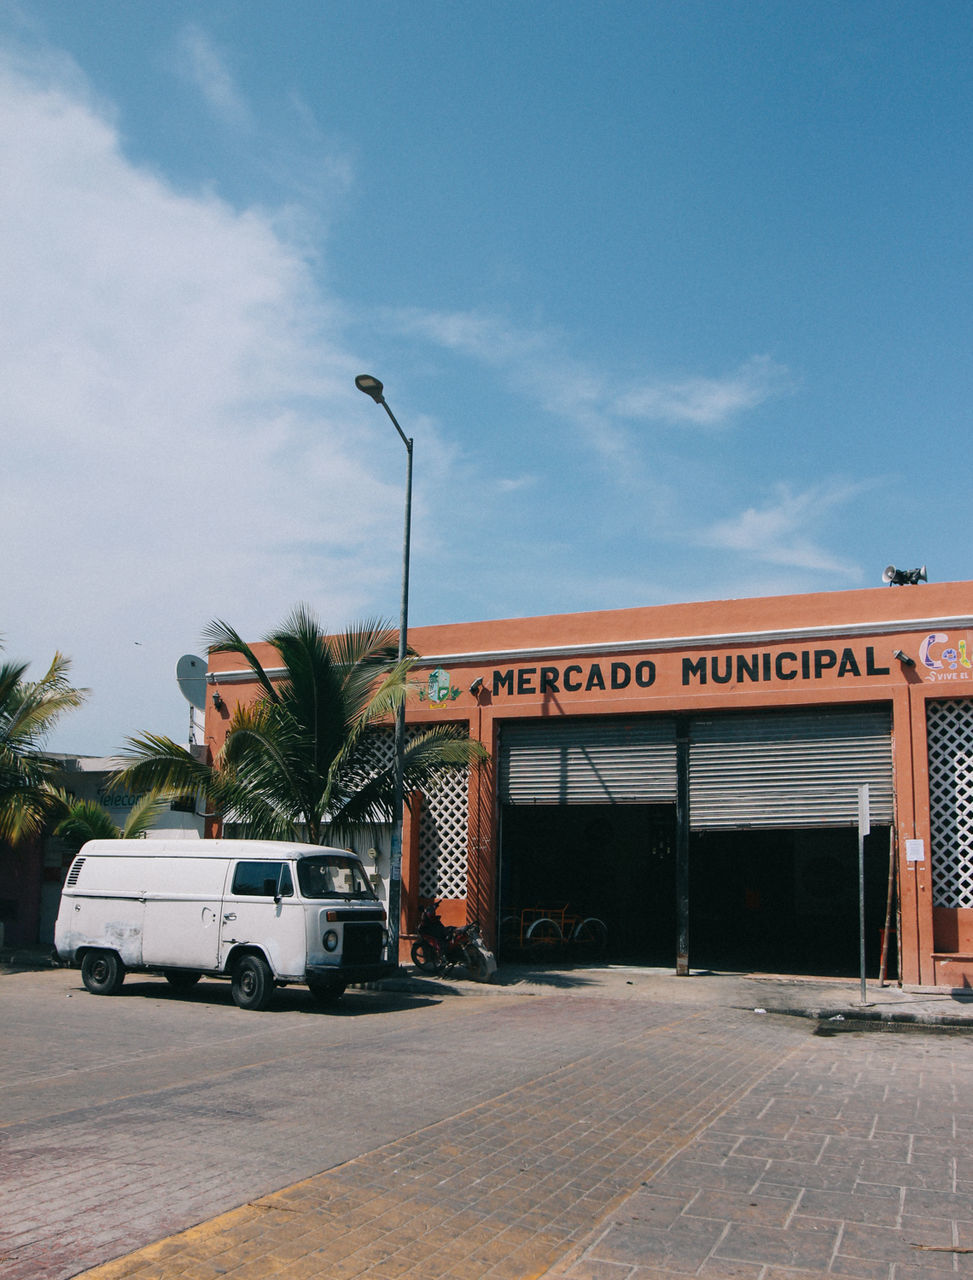 CARS ON ROAD AGAINST BUILDINGS